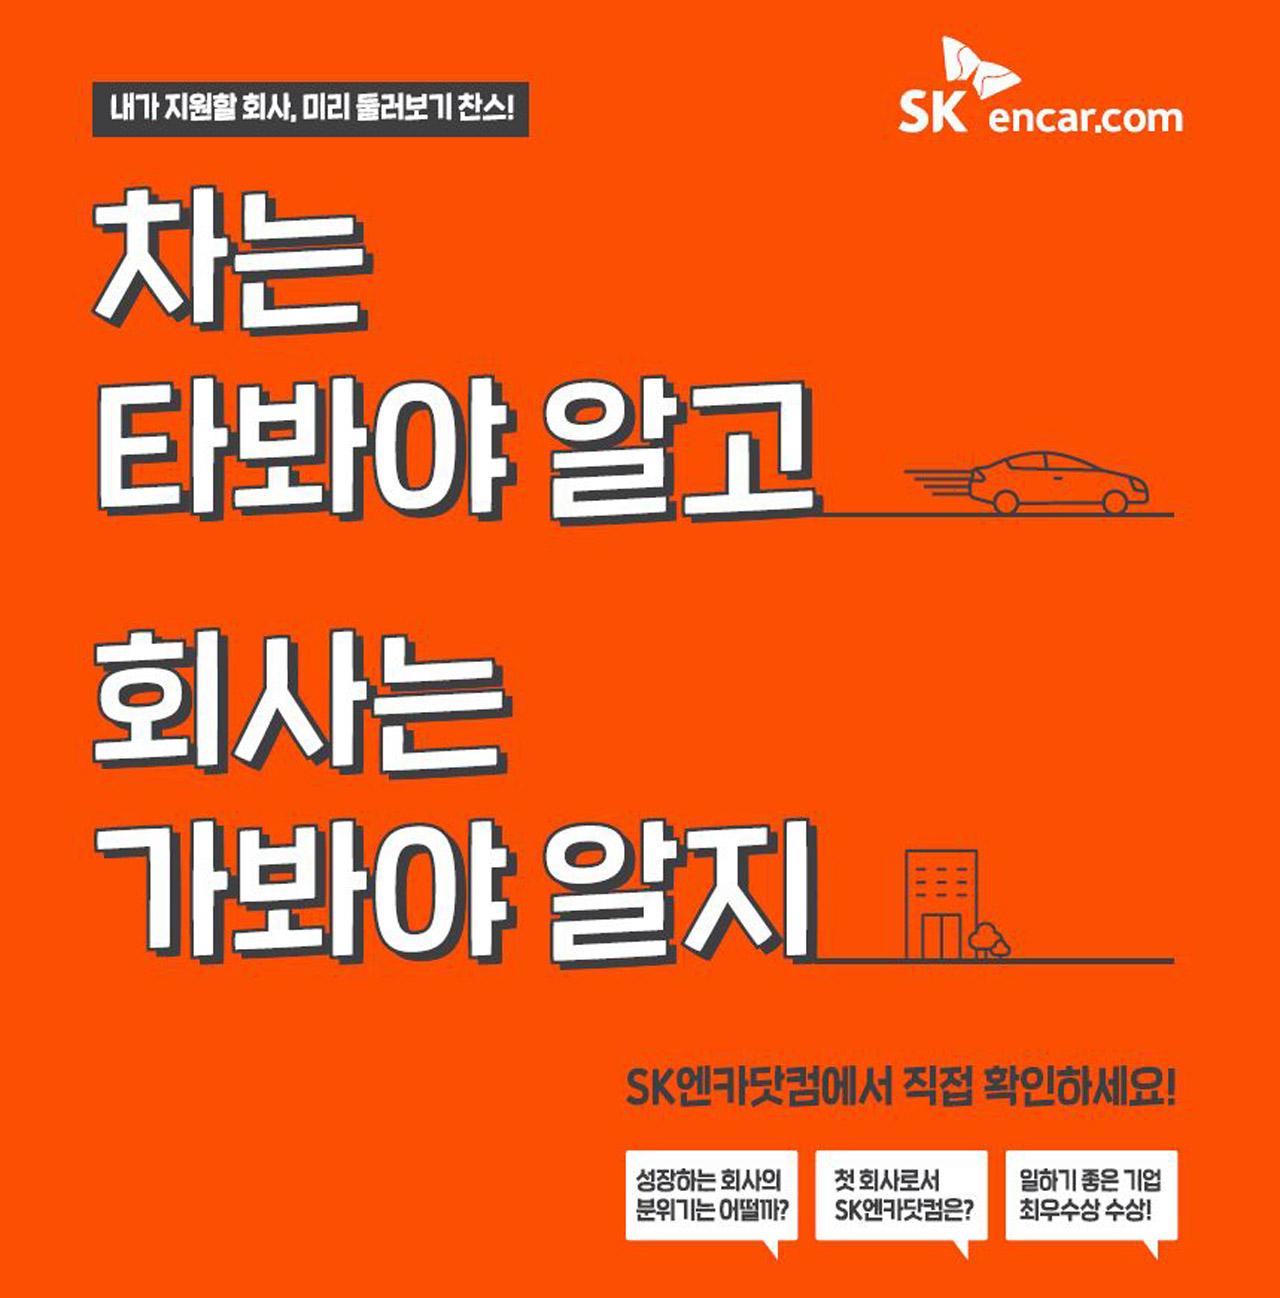 [SK엔카닷컴] SK엔카닷컴, 취준생 대상 회사 투어 진행